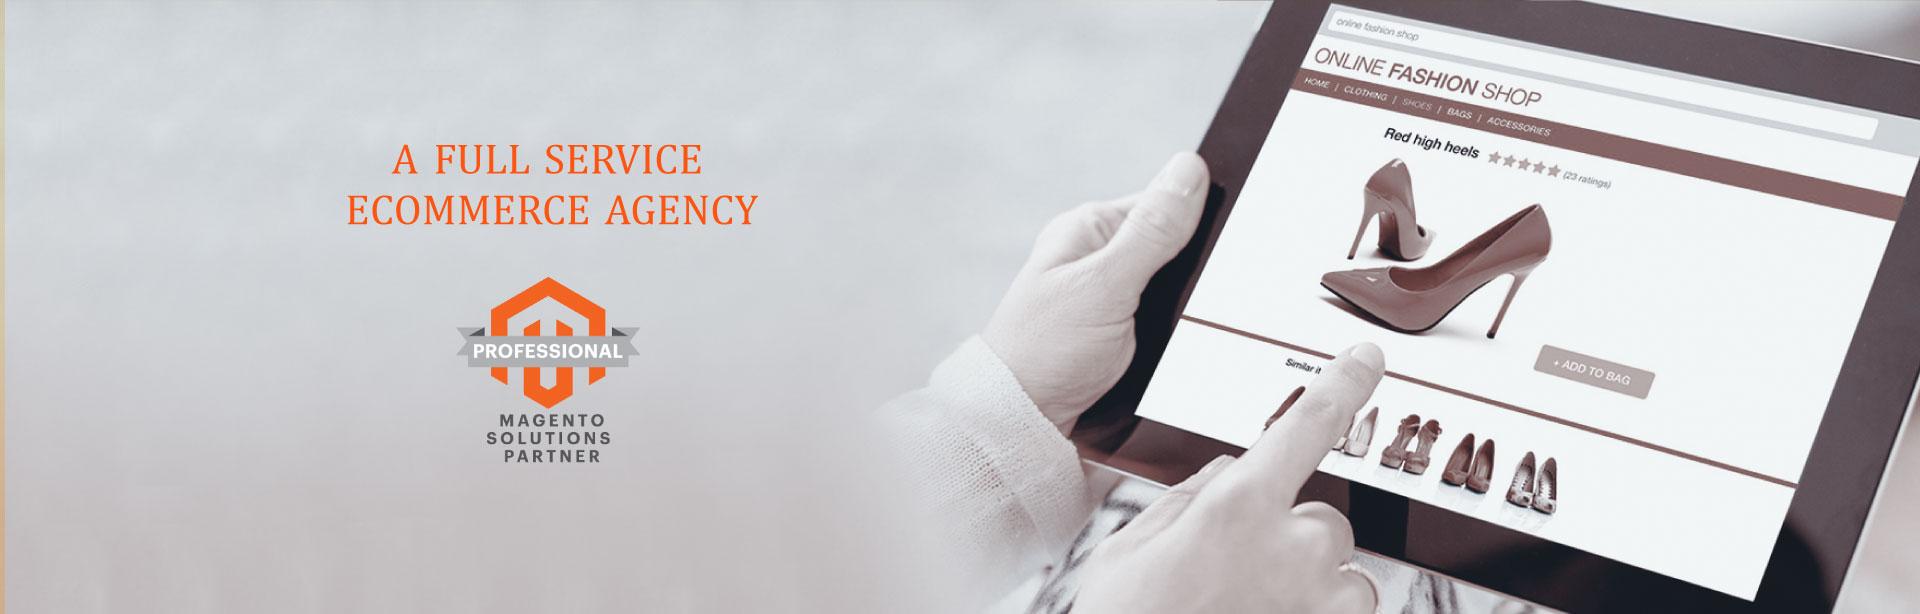 a42dc7e78b Converge ICT - Magento Professional Solutions Partner